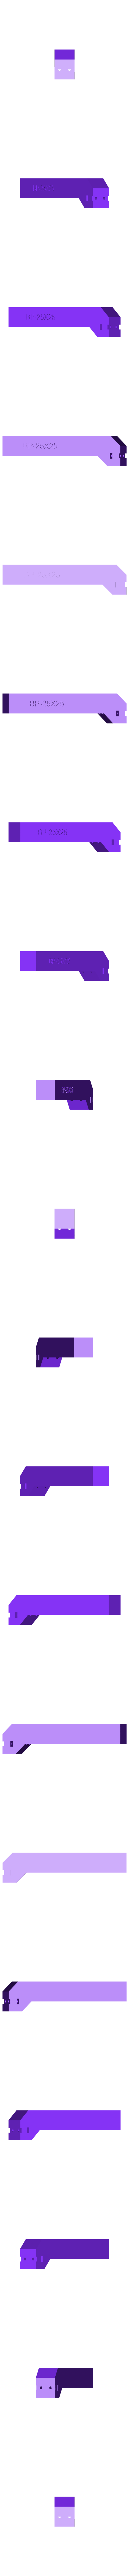 BP 25X25 Holder.stl Download STL file Bar Puller • 3D printing object, Kraai147